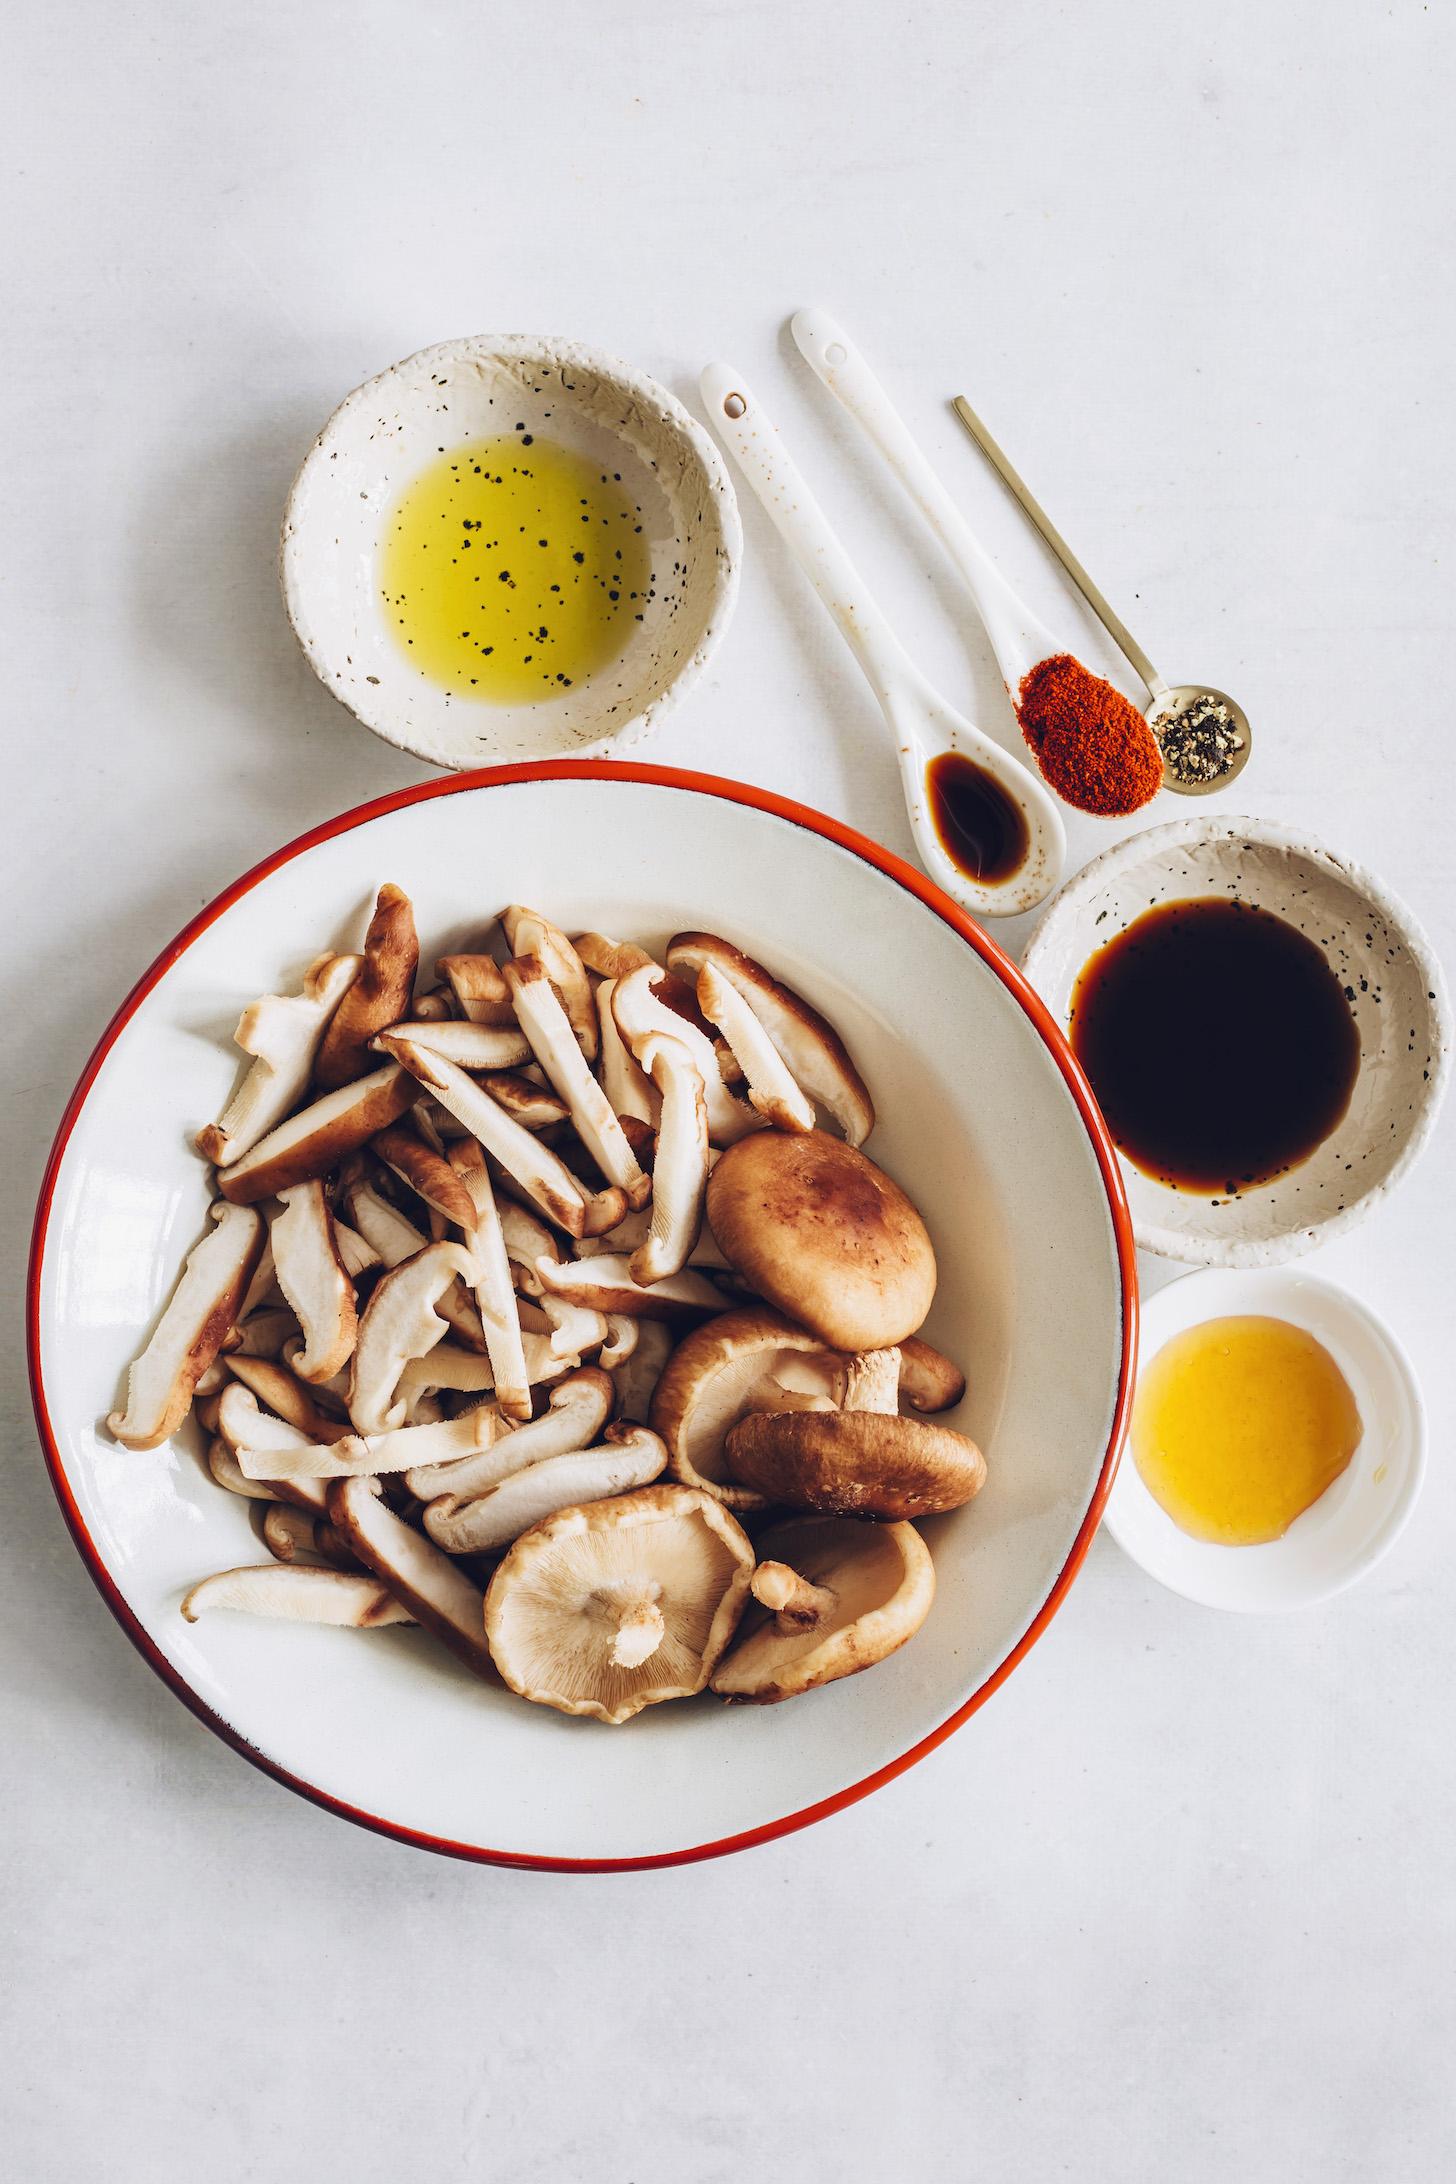 Sliced shiitake mushrooms, avocado oil, tamari, maple syrup, liquid smoke, black pepper, and smoked paprika